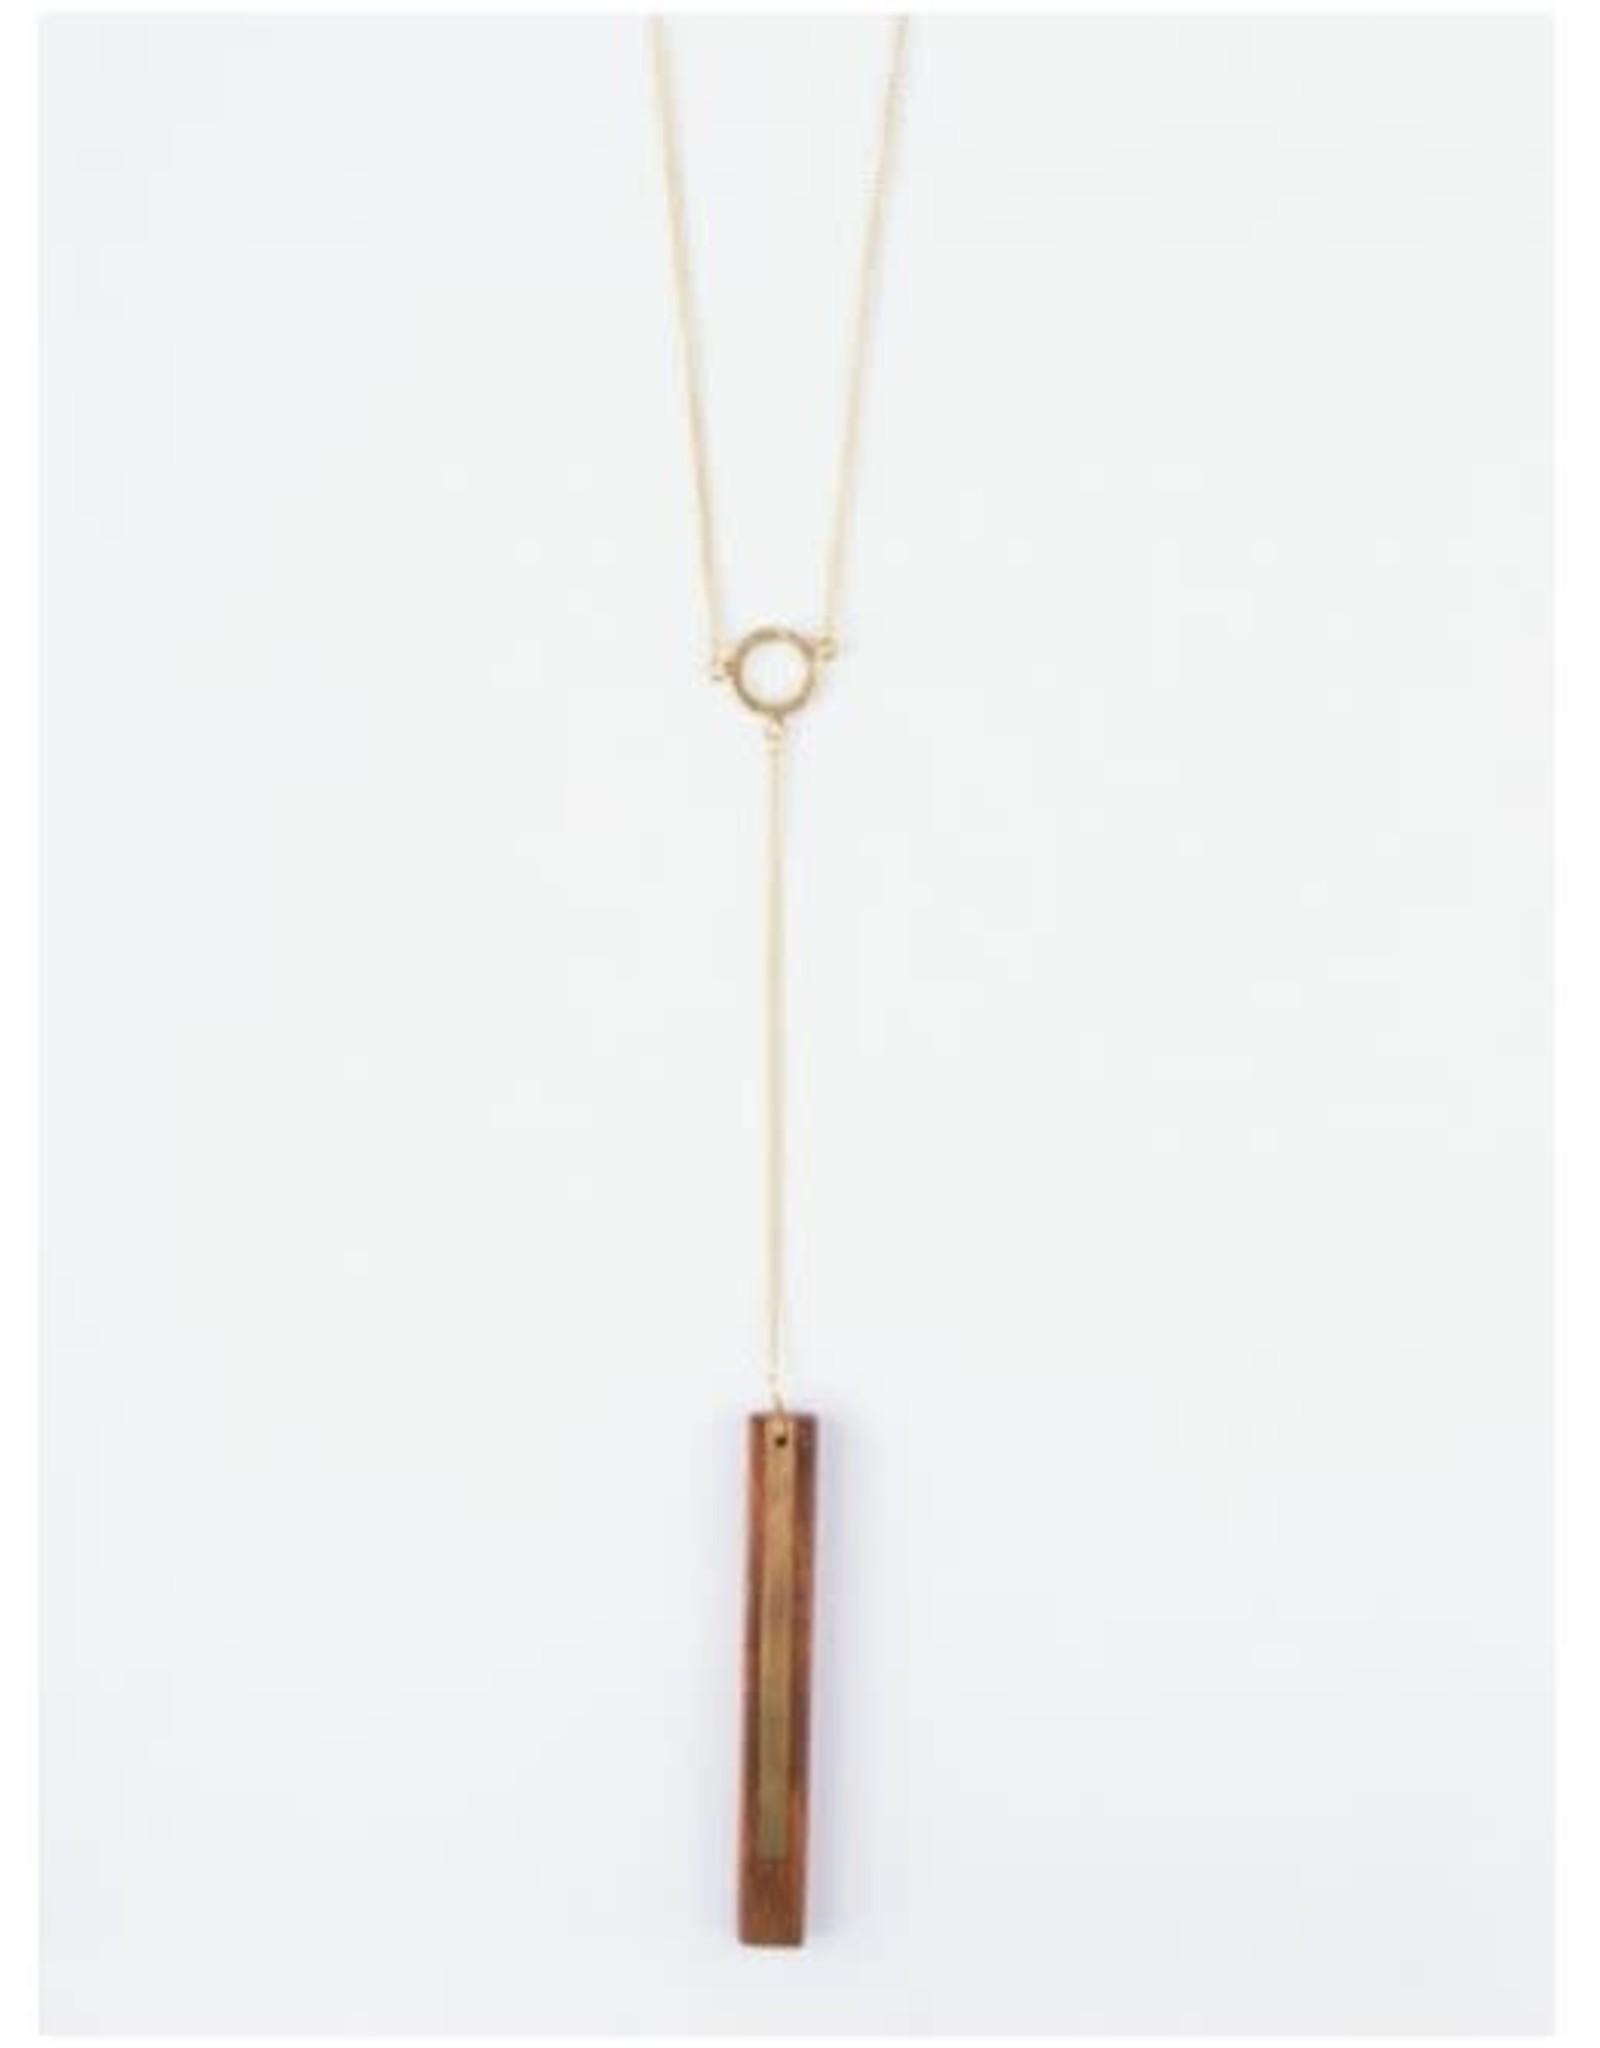 Winslow Wood Necklace, India